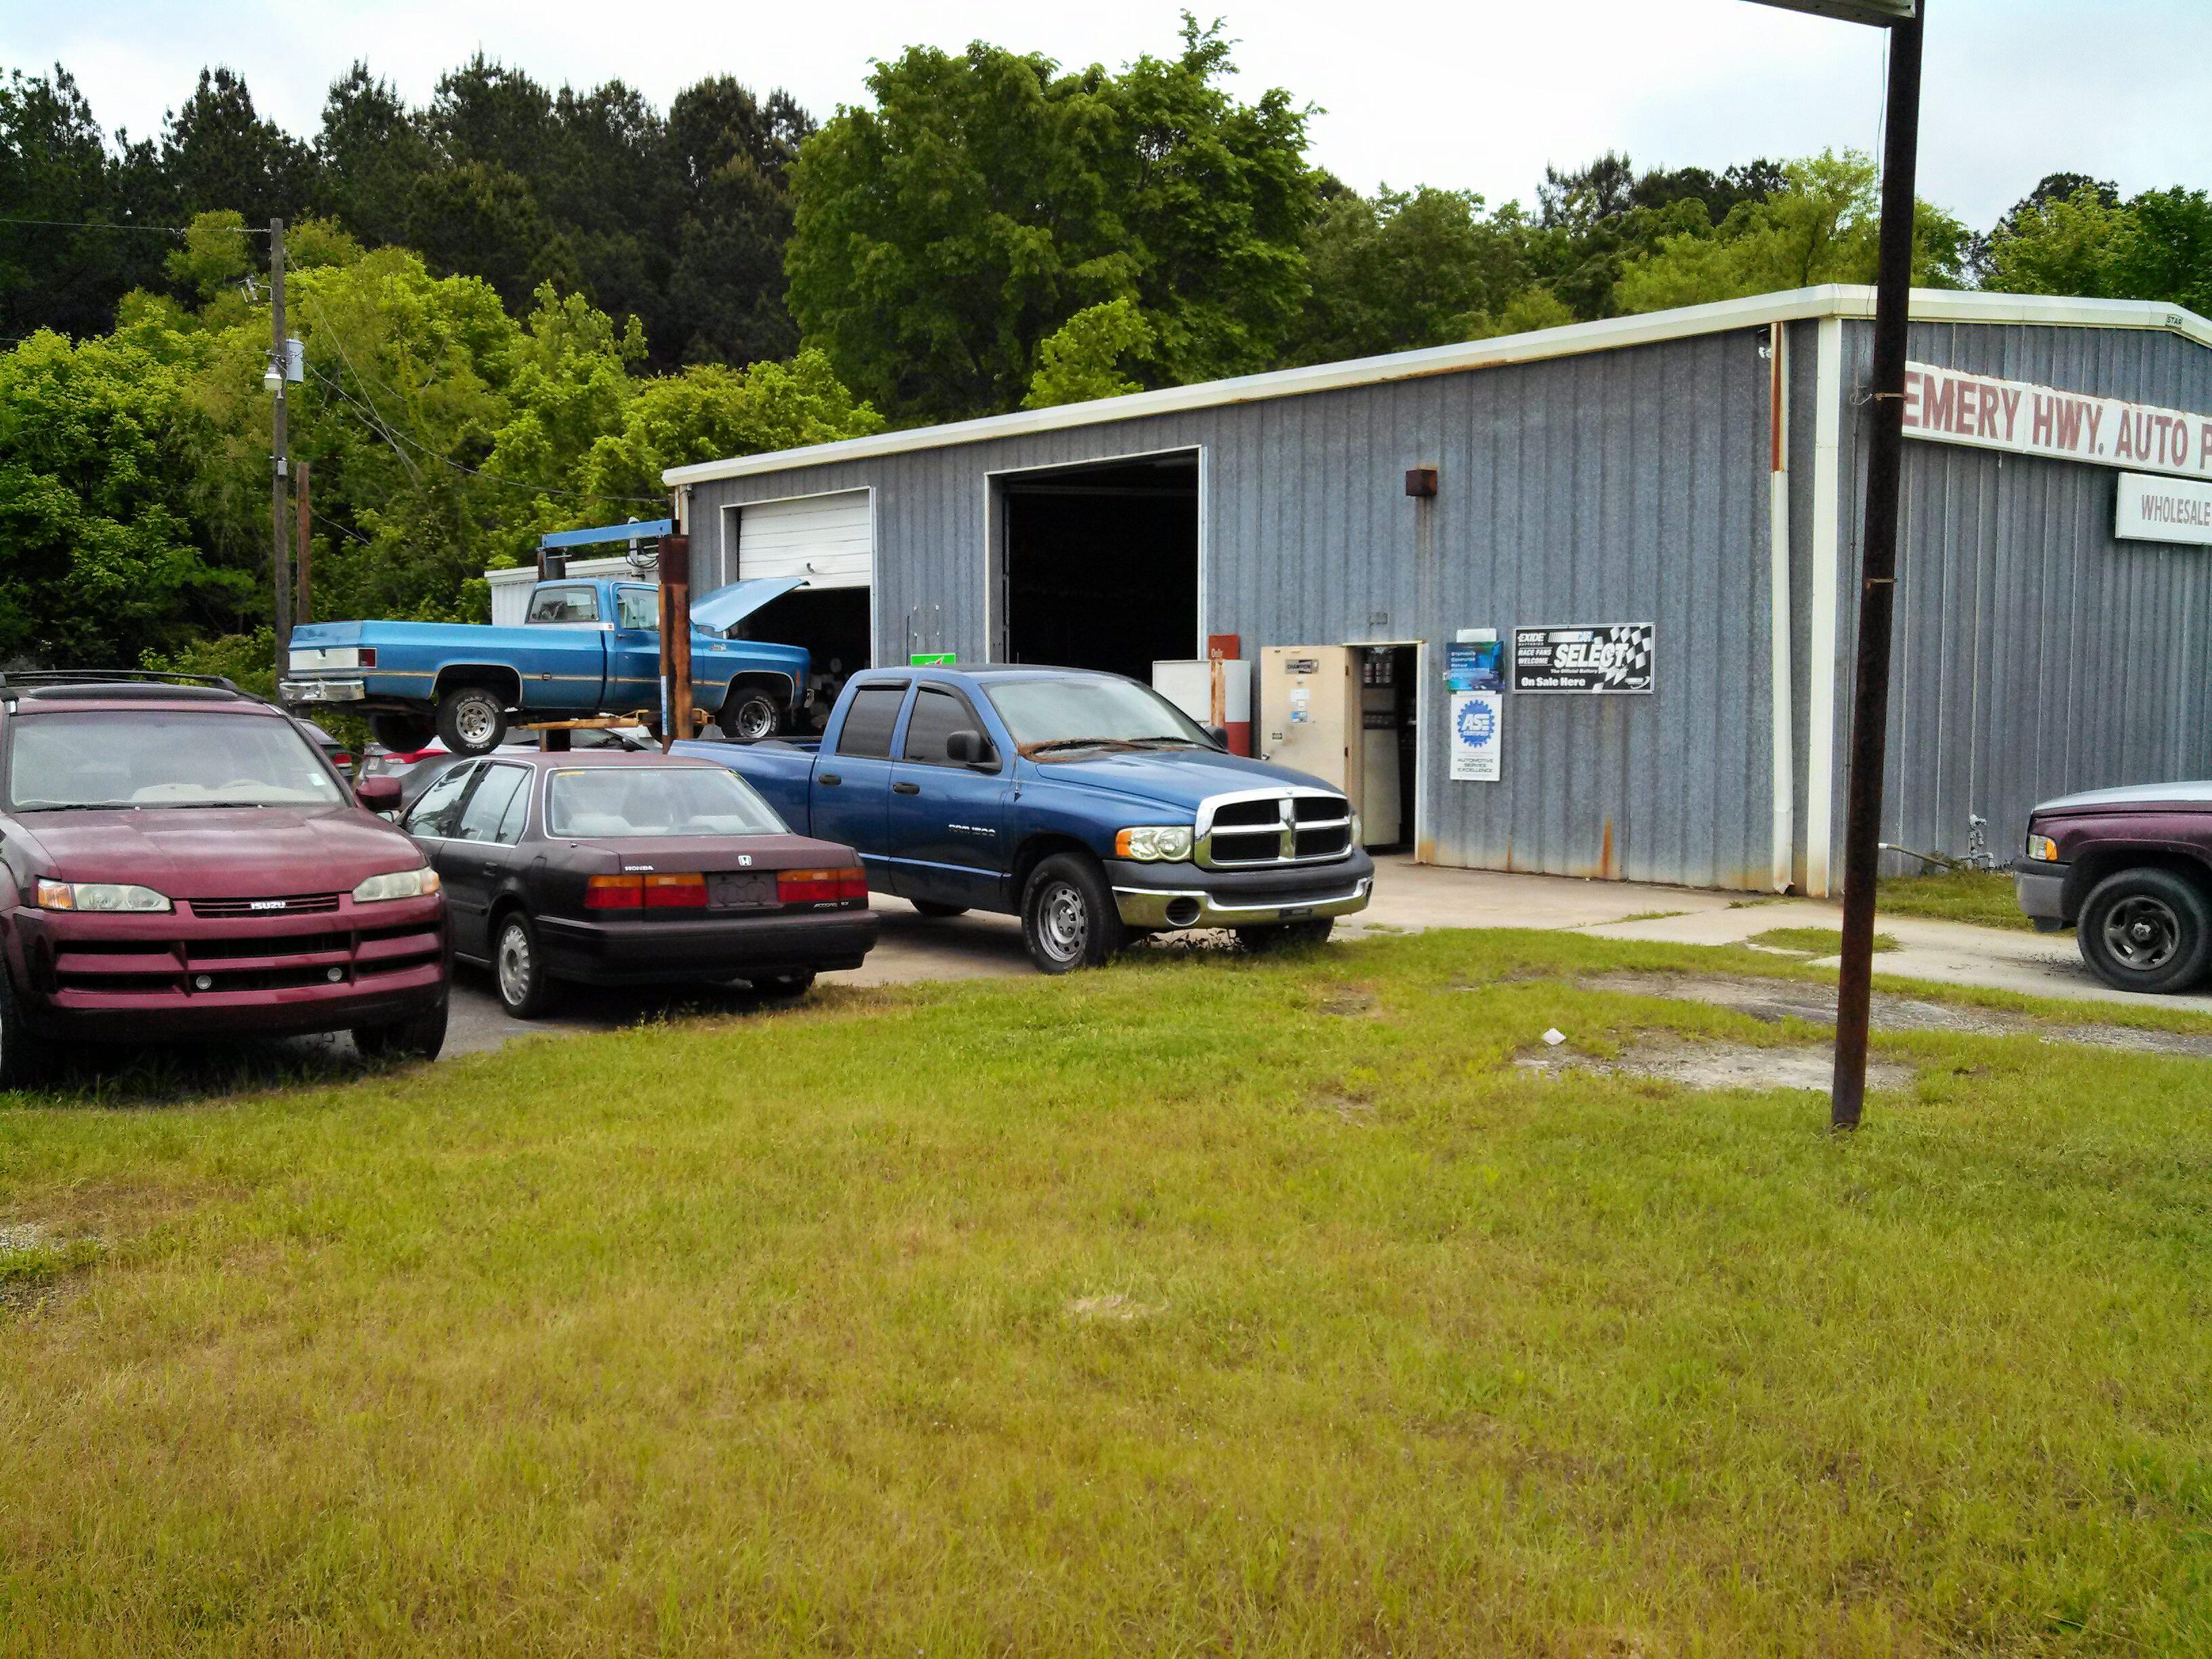 Emery Hwy Auto Parts & Service 523 merce Dr Macon GA YP